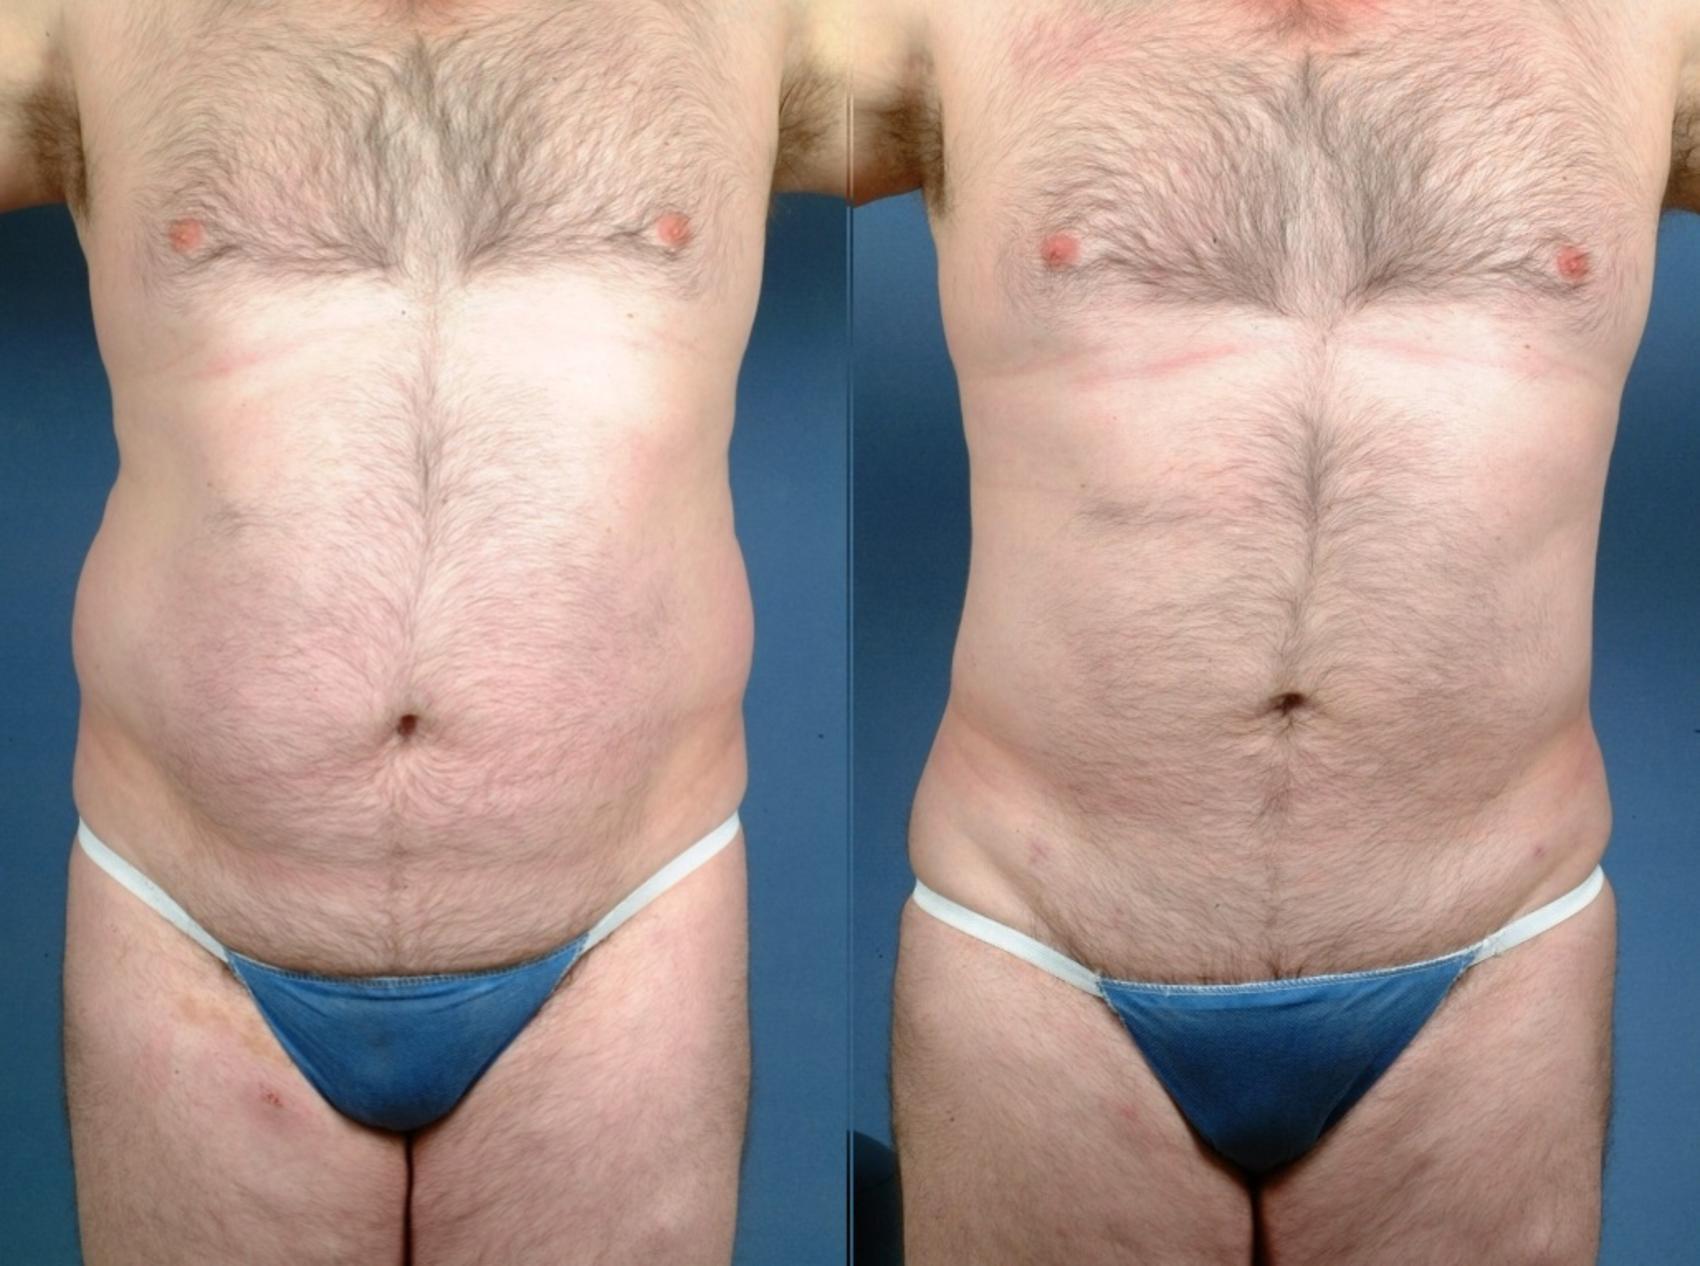 Liposuction Before After Photo Gallery Louisville Ky Caloaesthetics Plastic Surgery Center